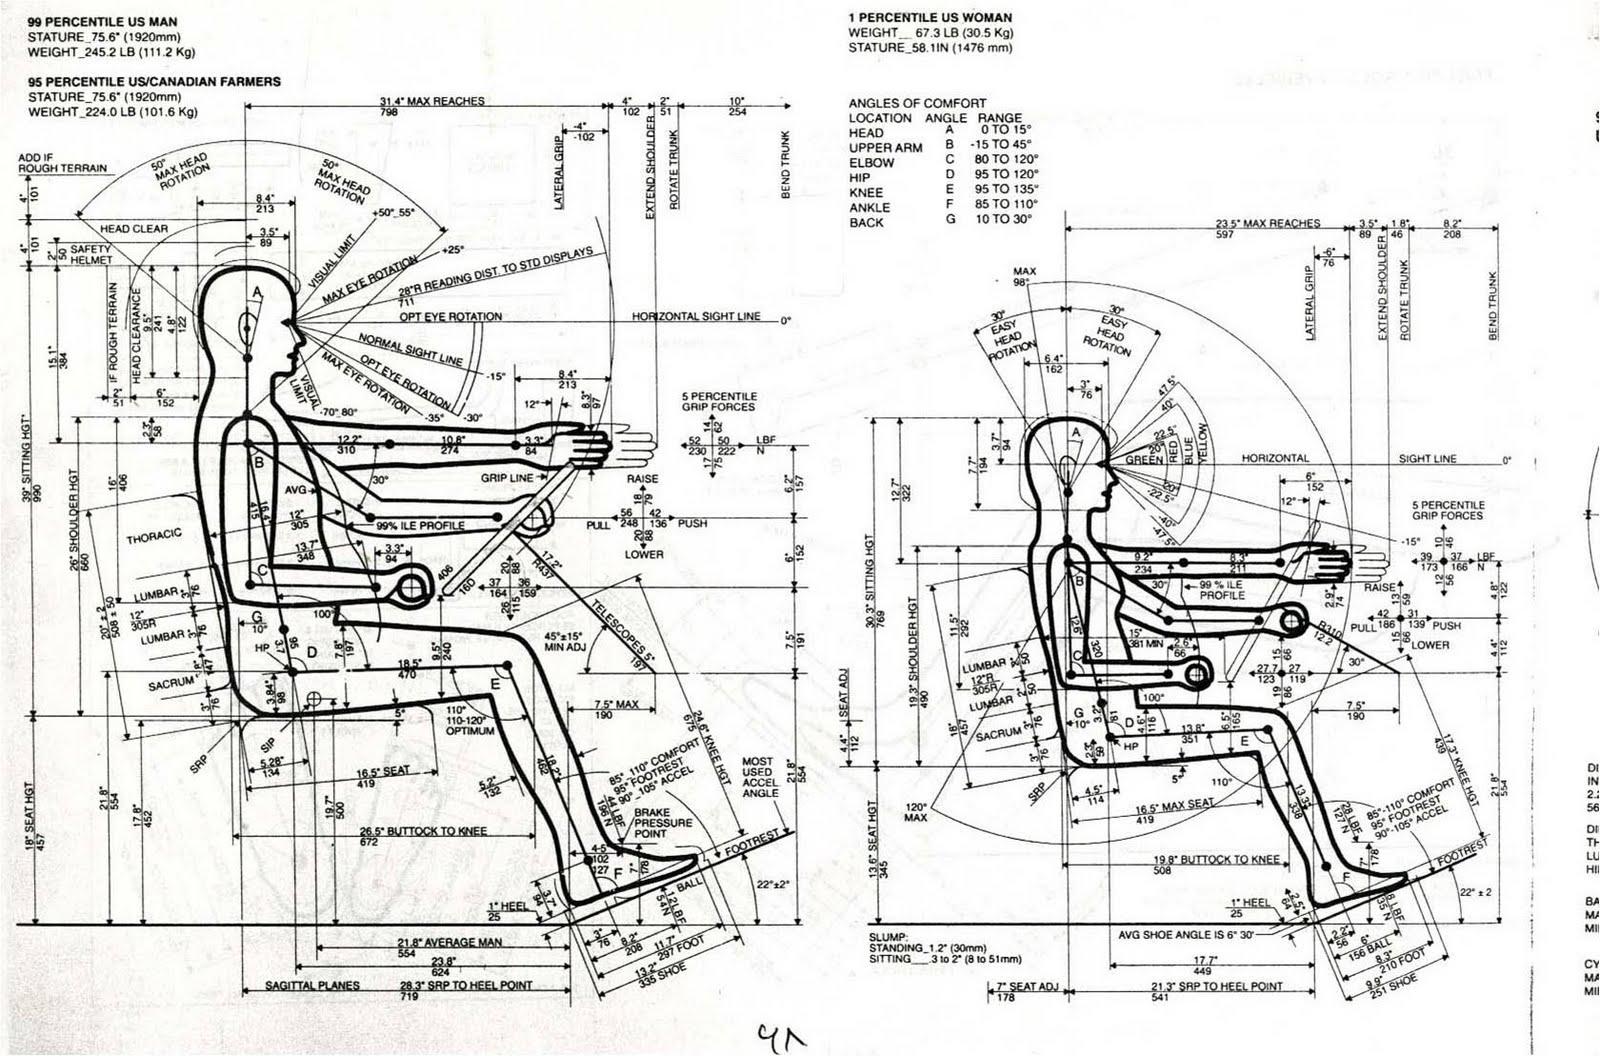 Automobile Comfort And Ergonomics